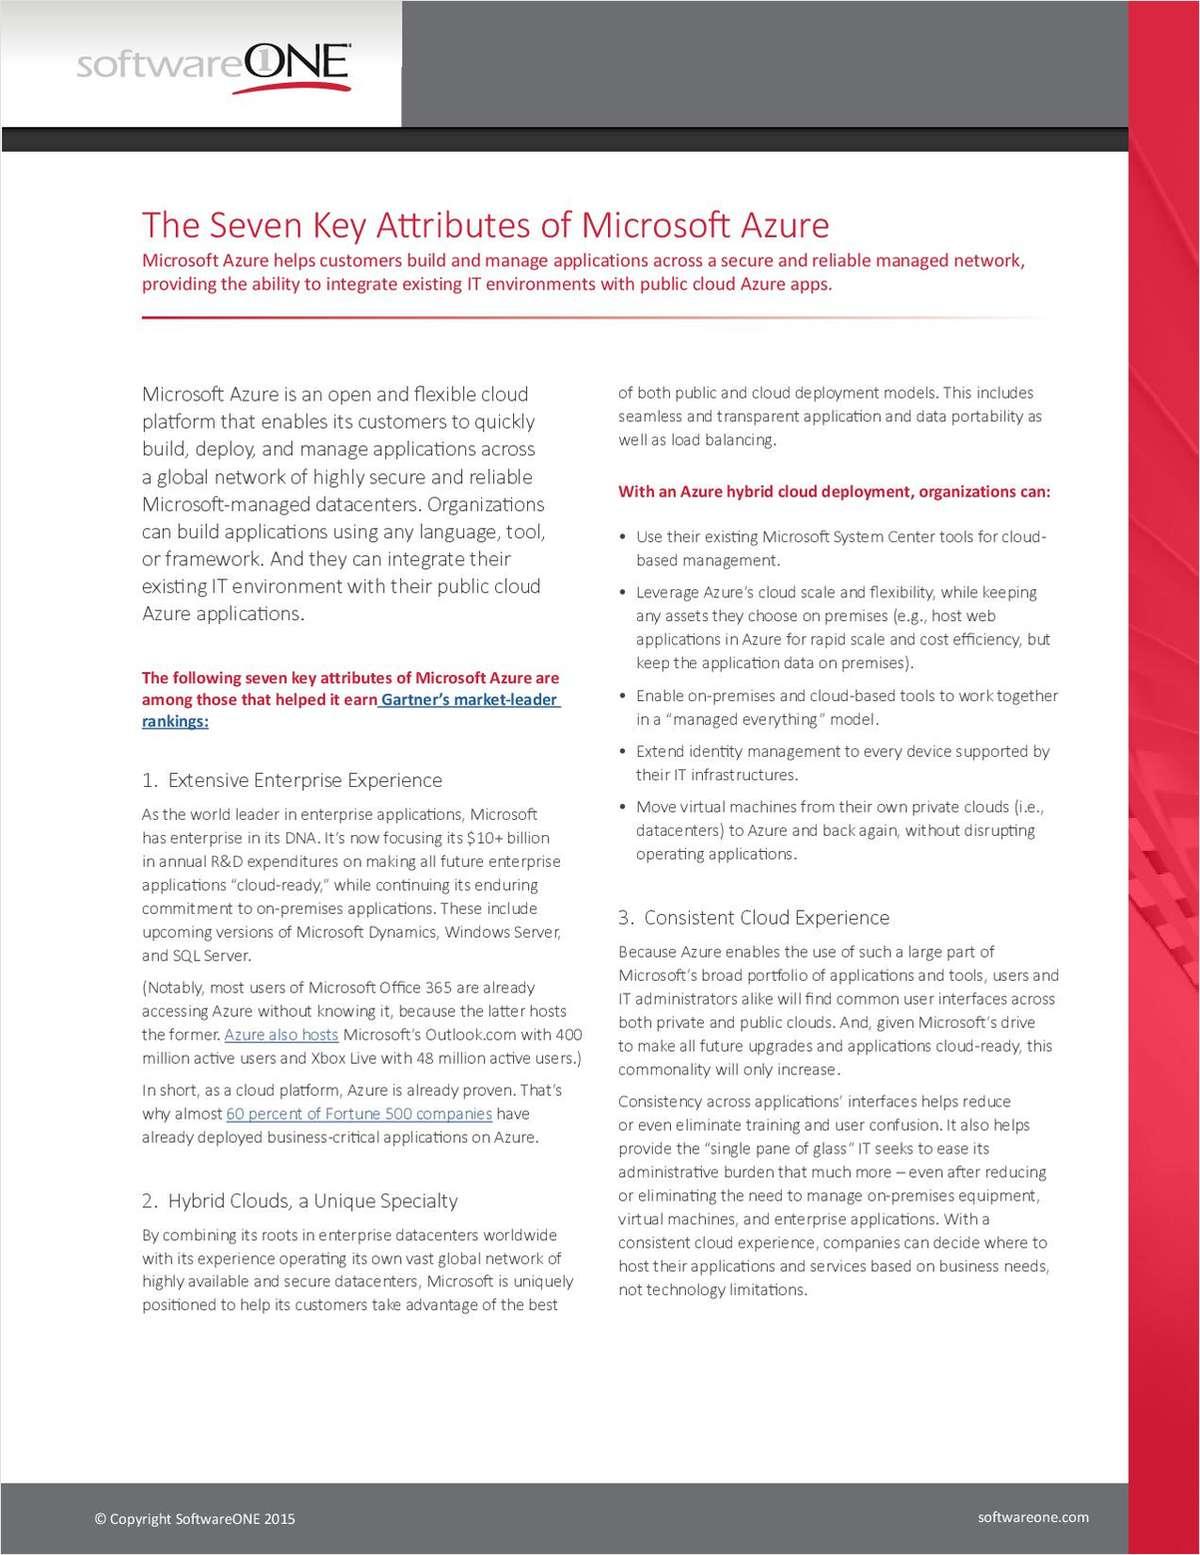 The Seven Key Attributes of Microsoft Azure